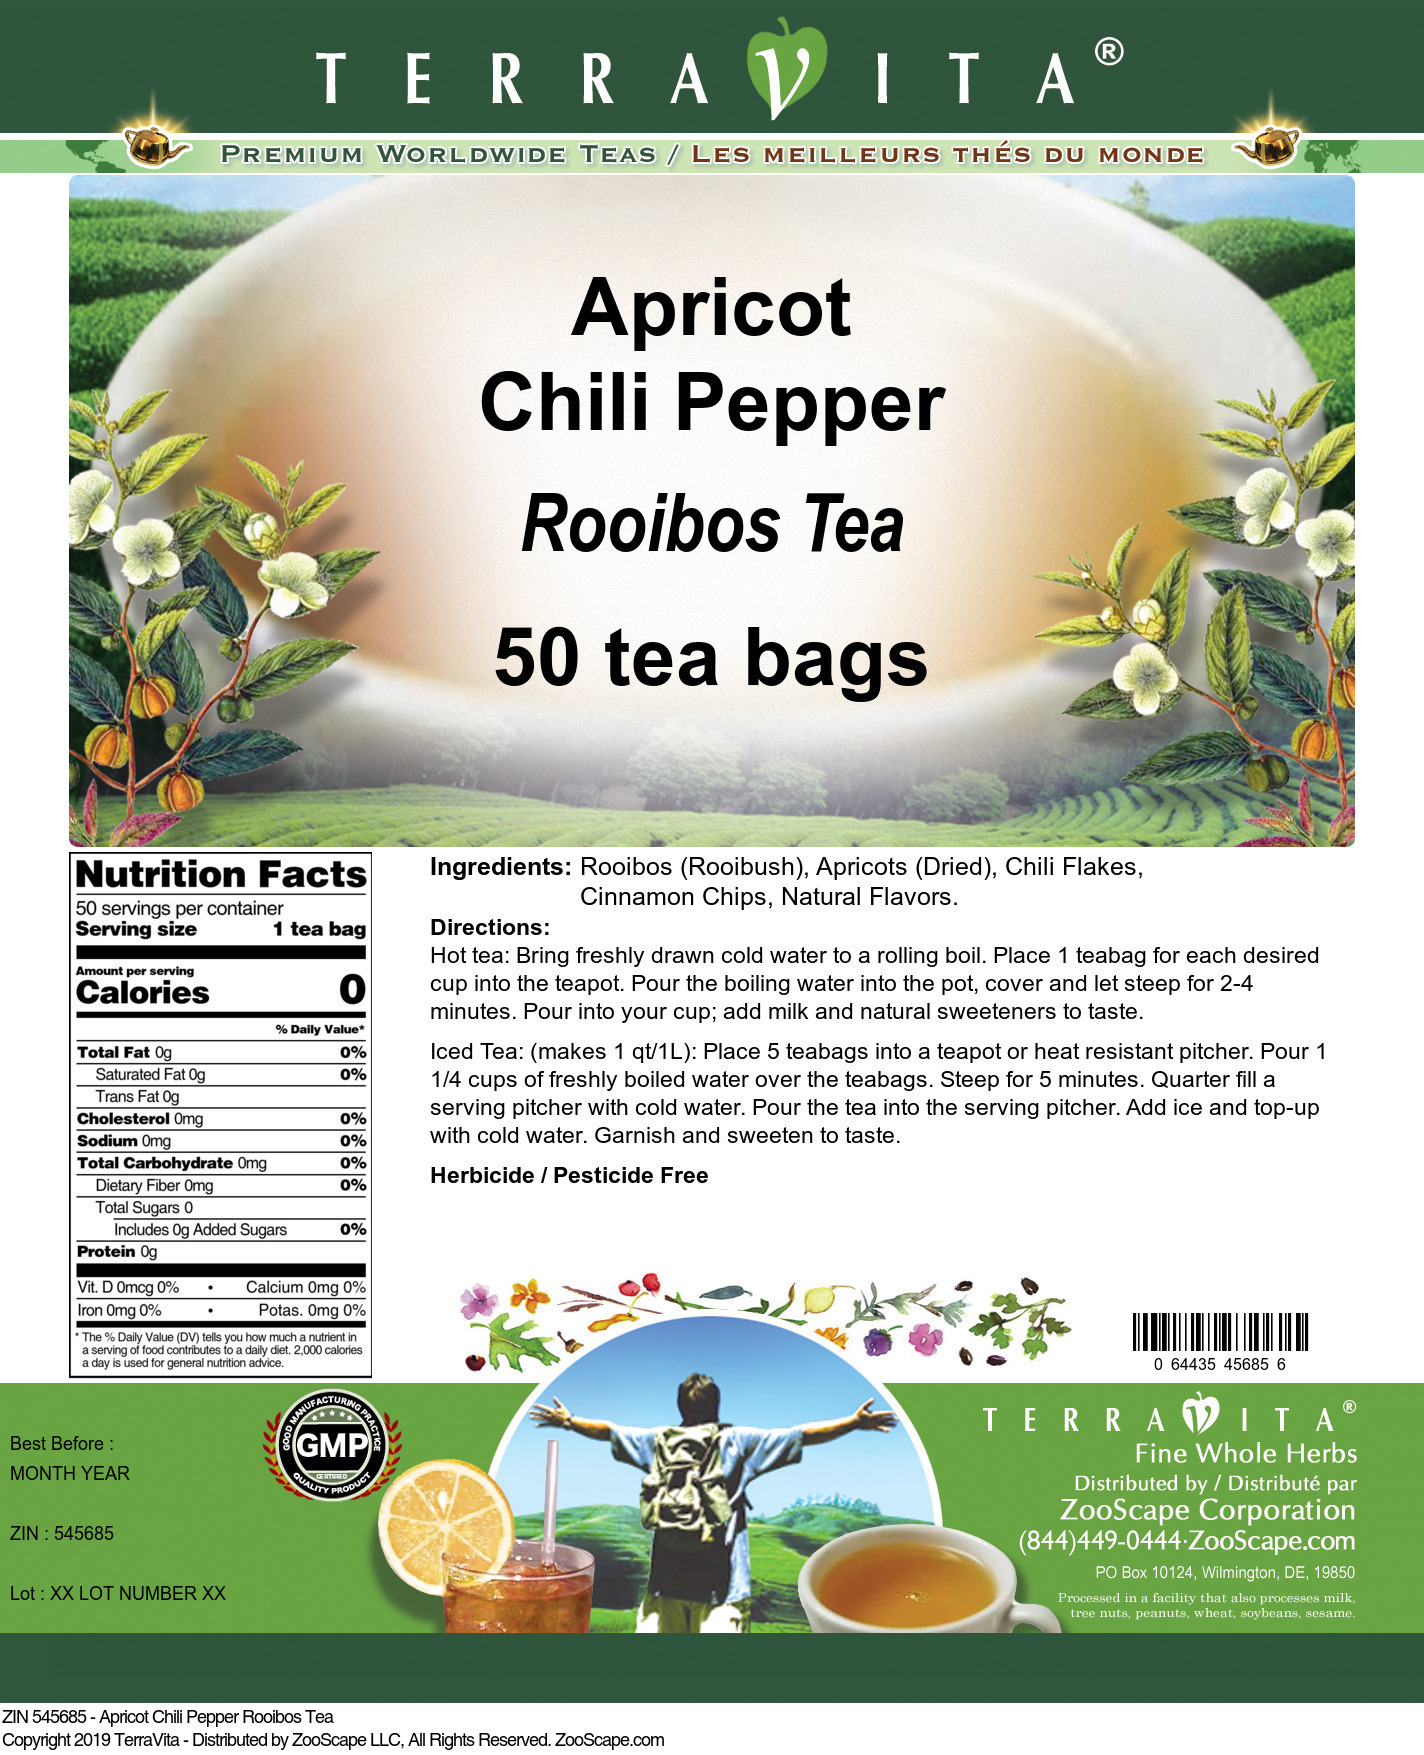 Apricot Chili Pepper Rooibos Tea